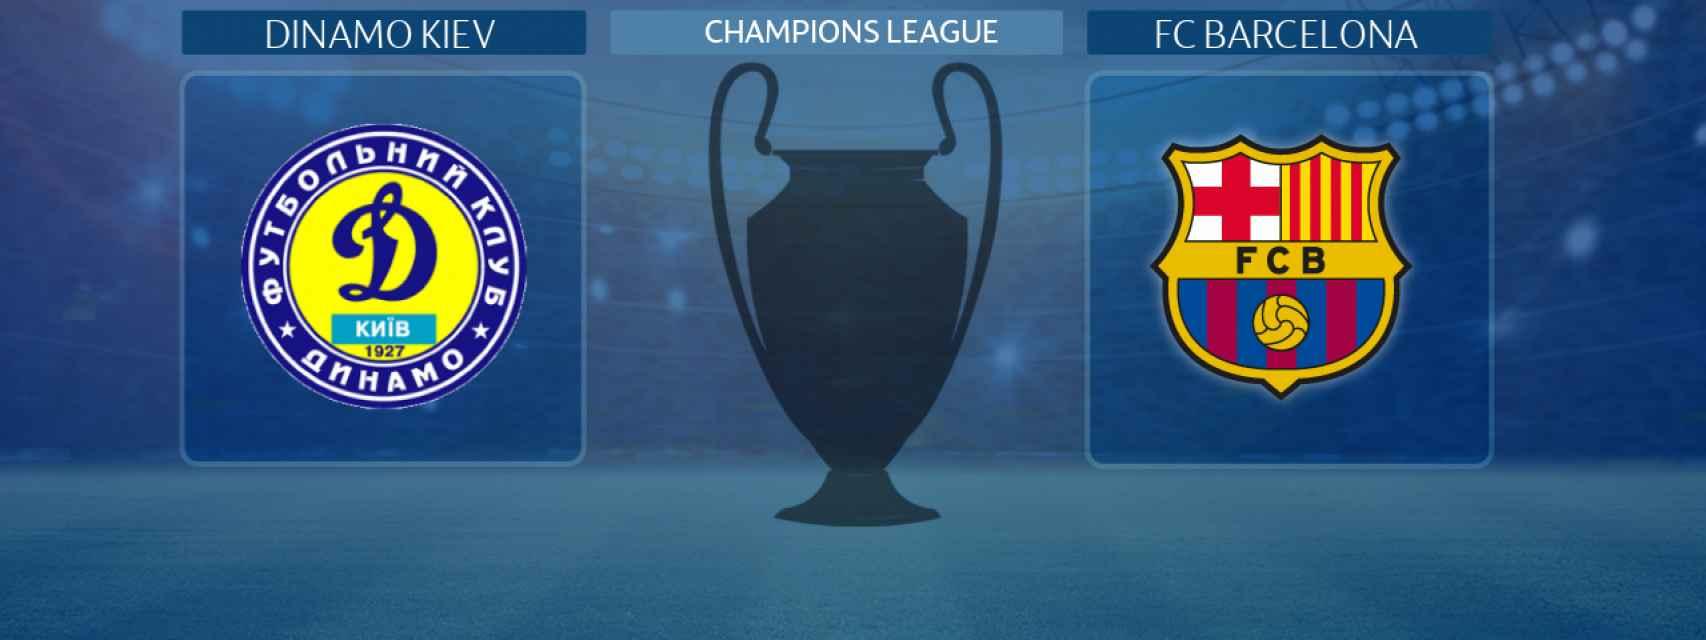 Dinamo Kiev - FC Barcelona, partido de la Champions League